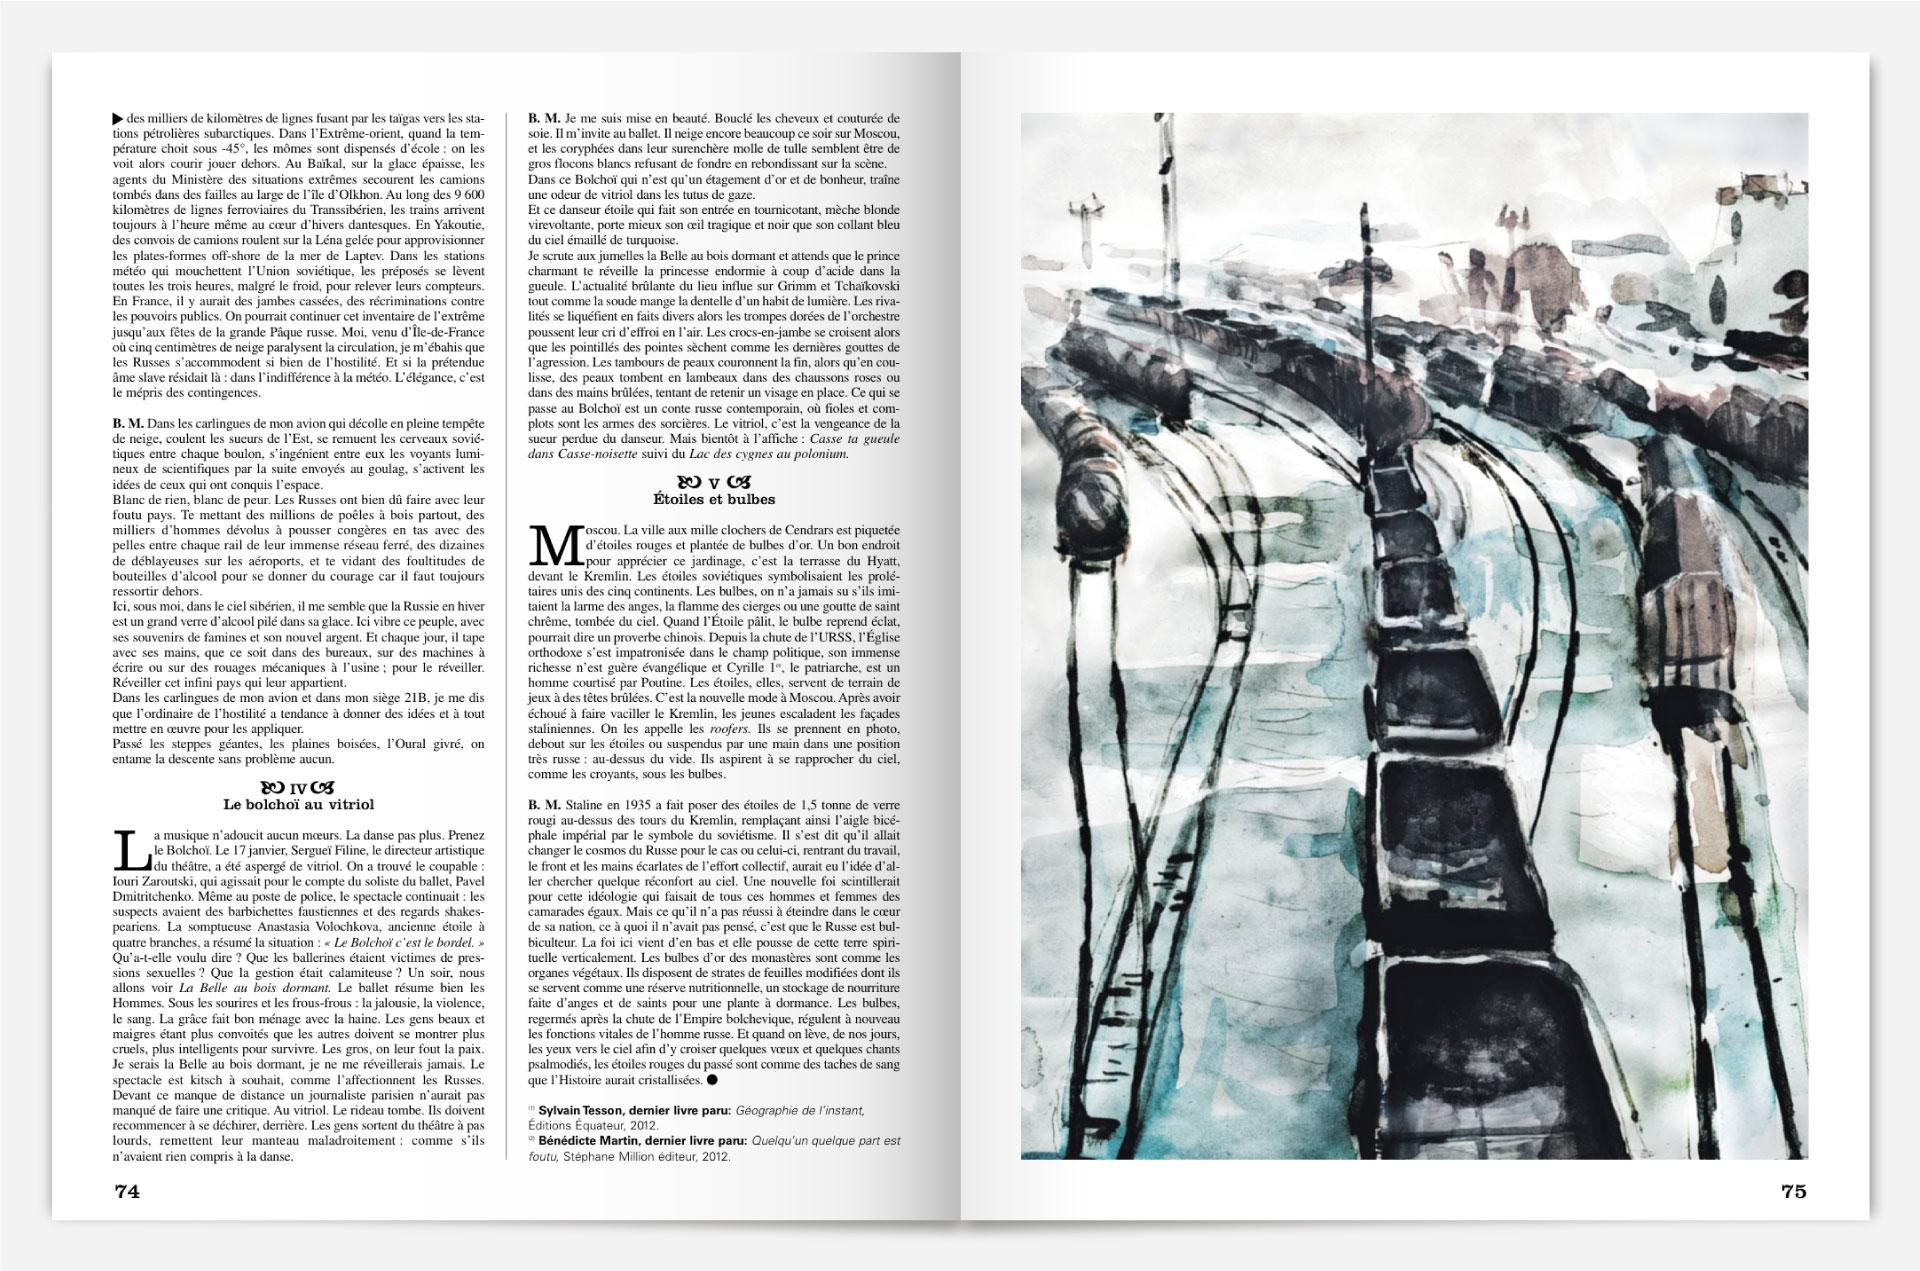 next-liberation-trains